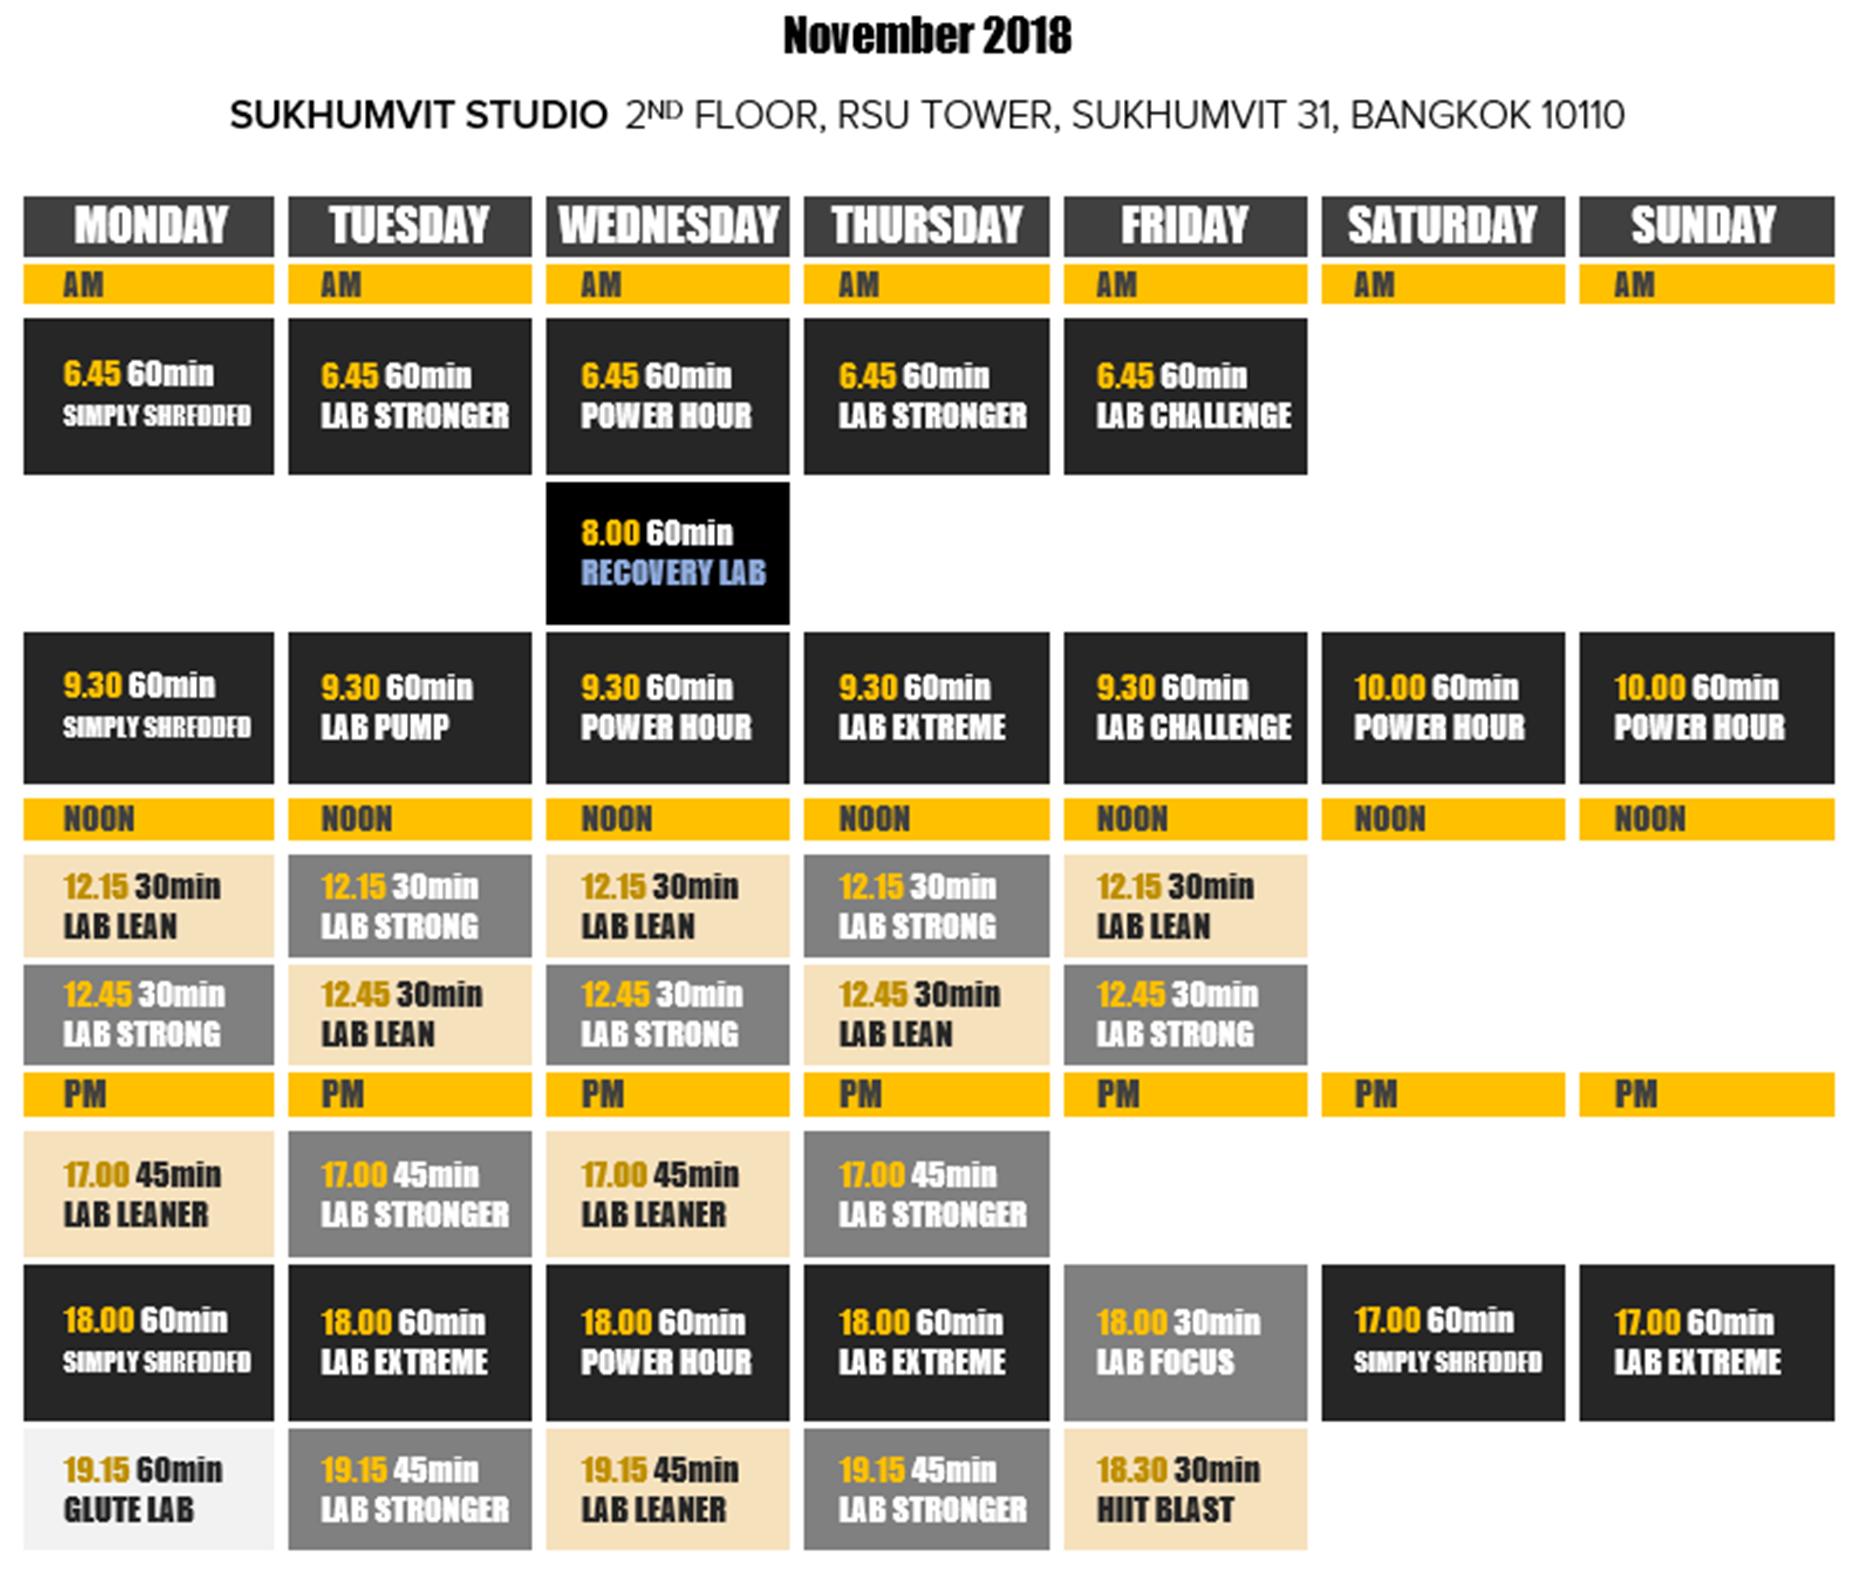 sukhumvit-timetable-november-2018-2